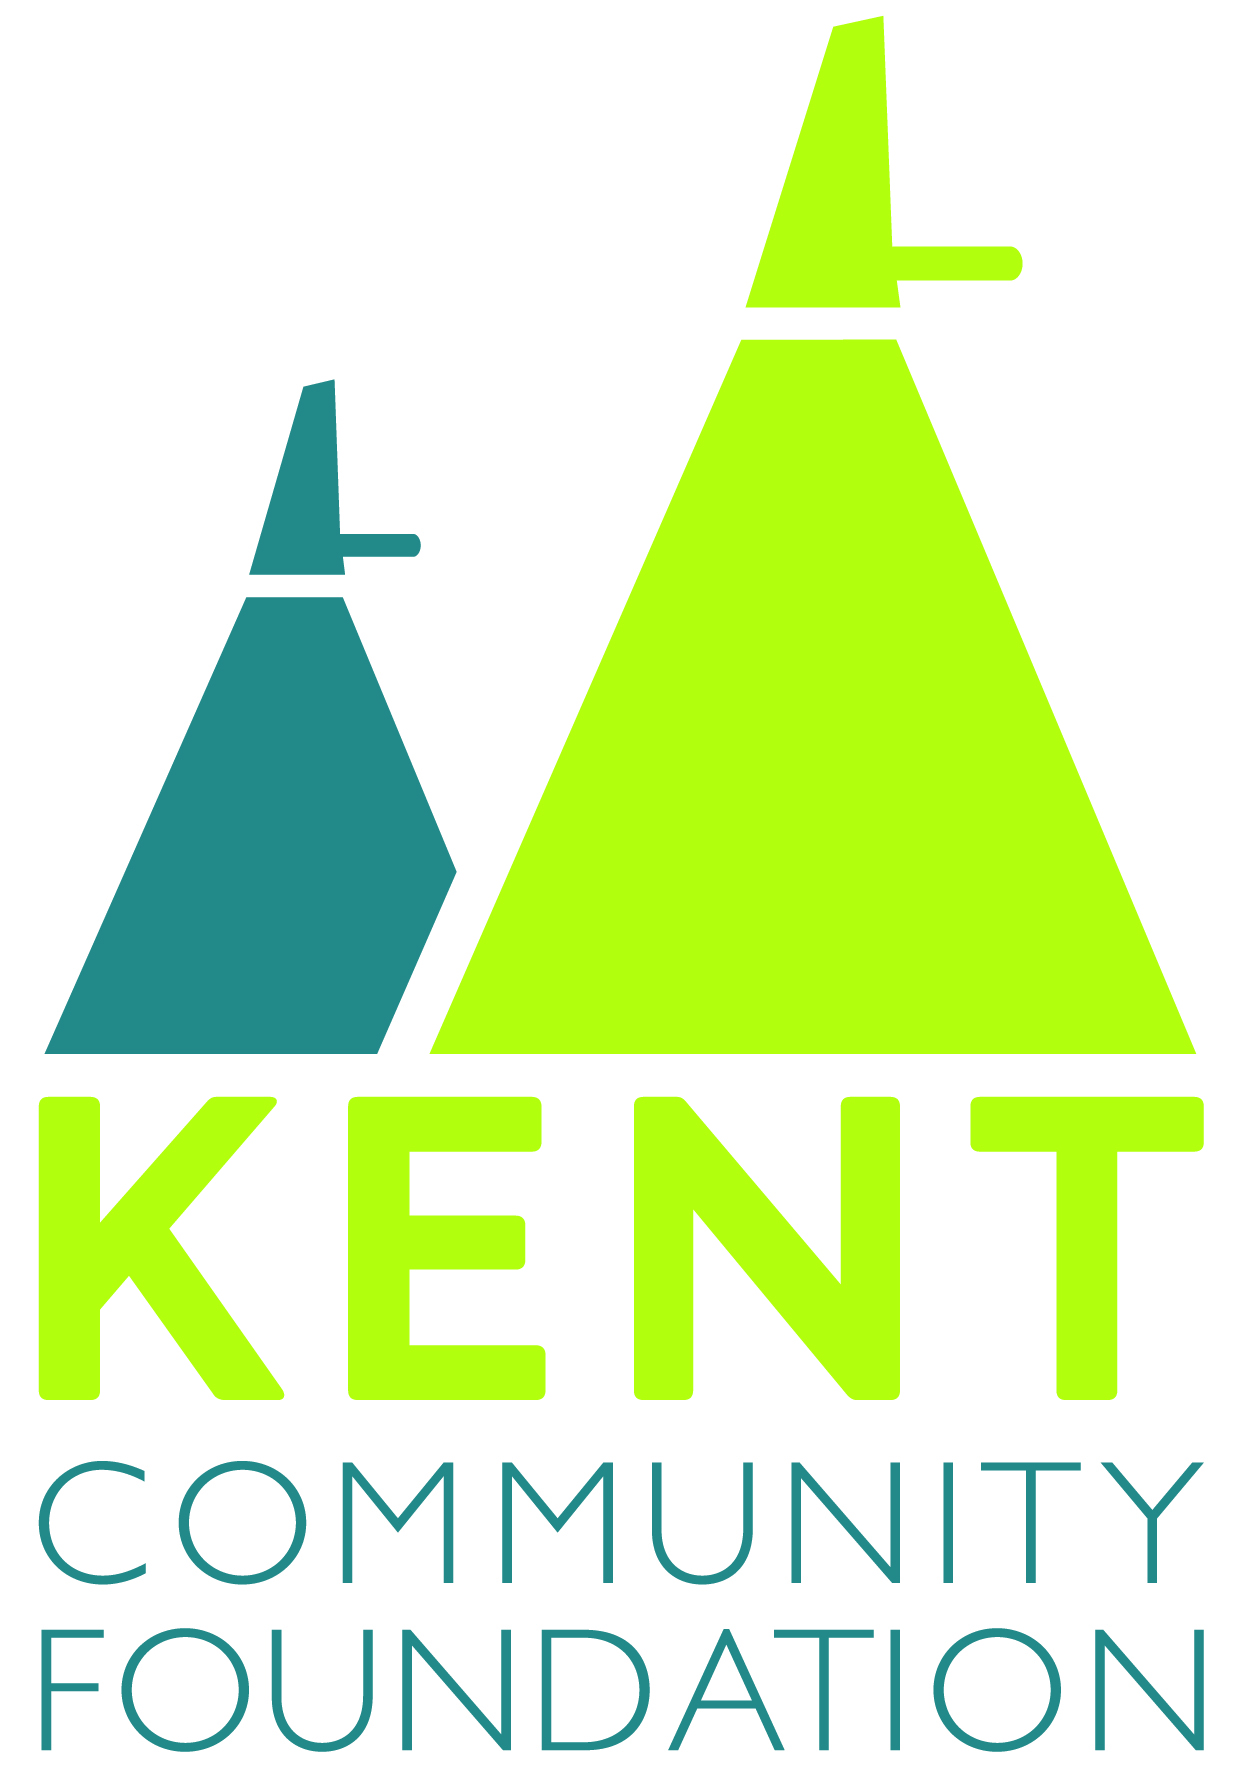 KCF-Logo-CMYK (USE).jpg